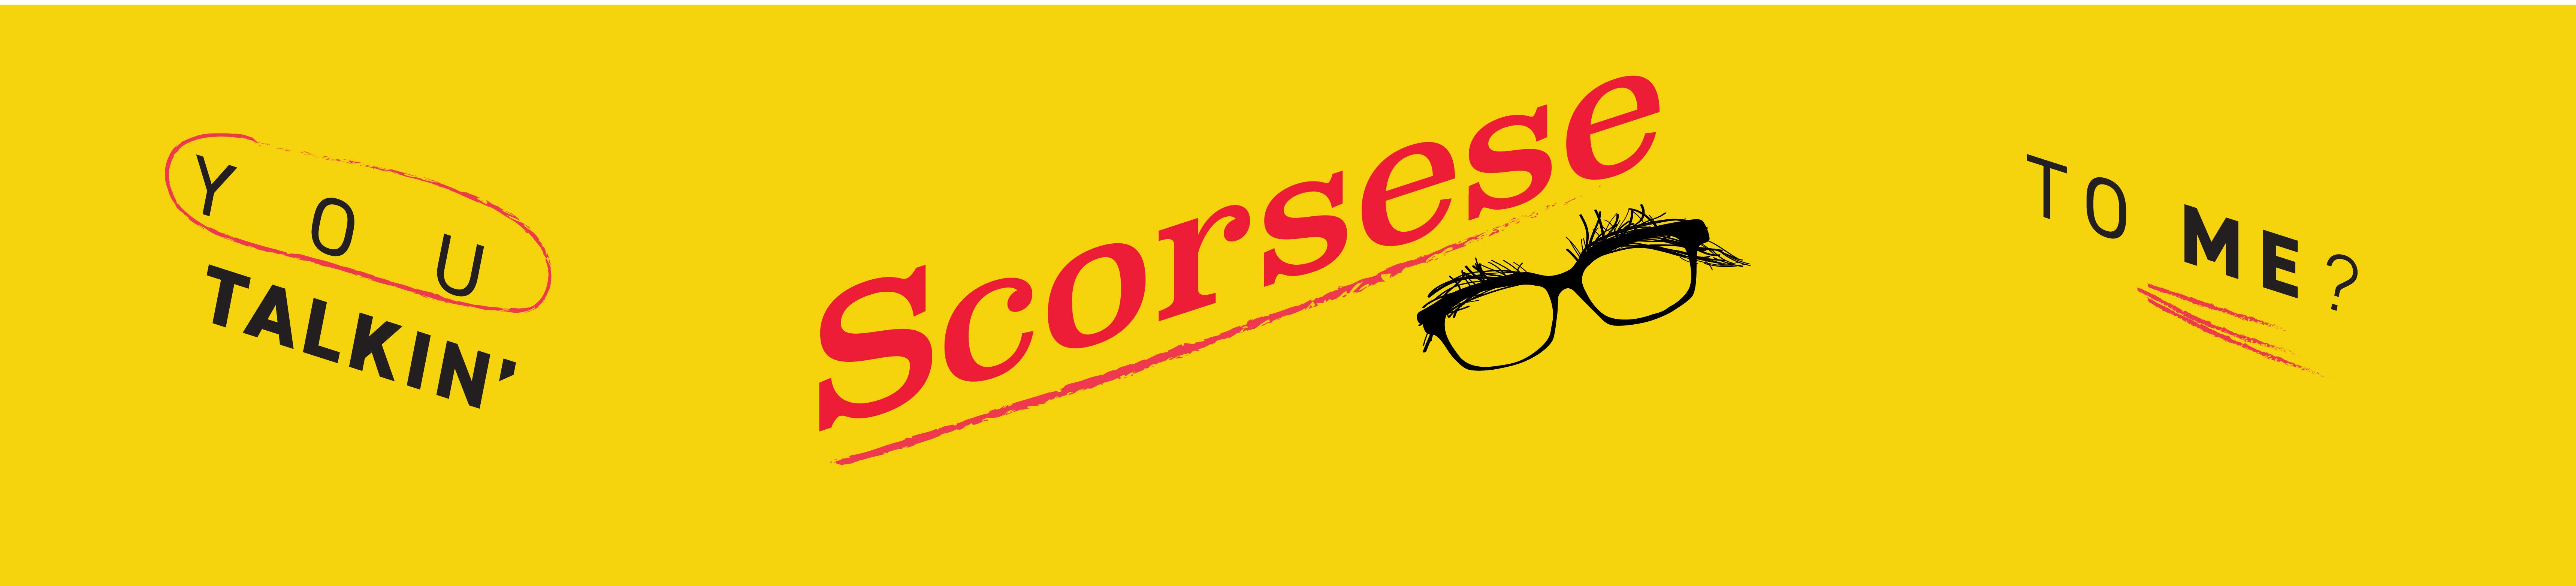 Scorsese Banner